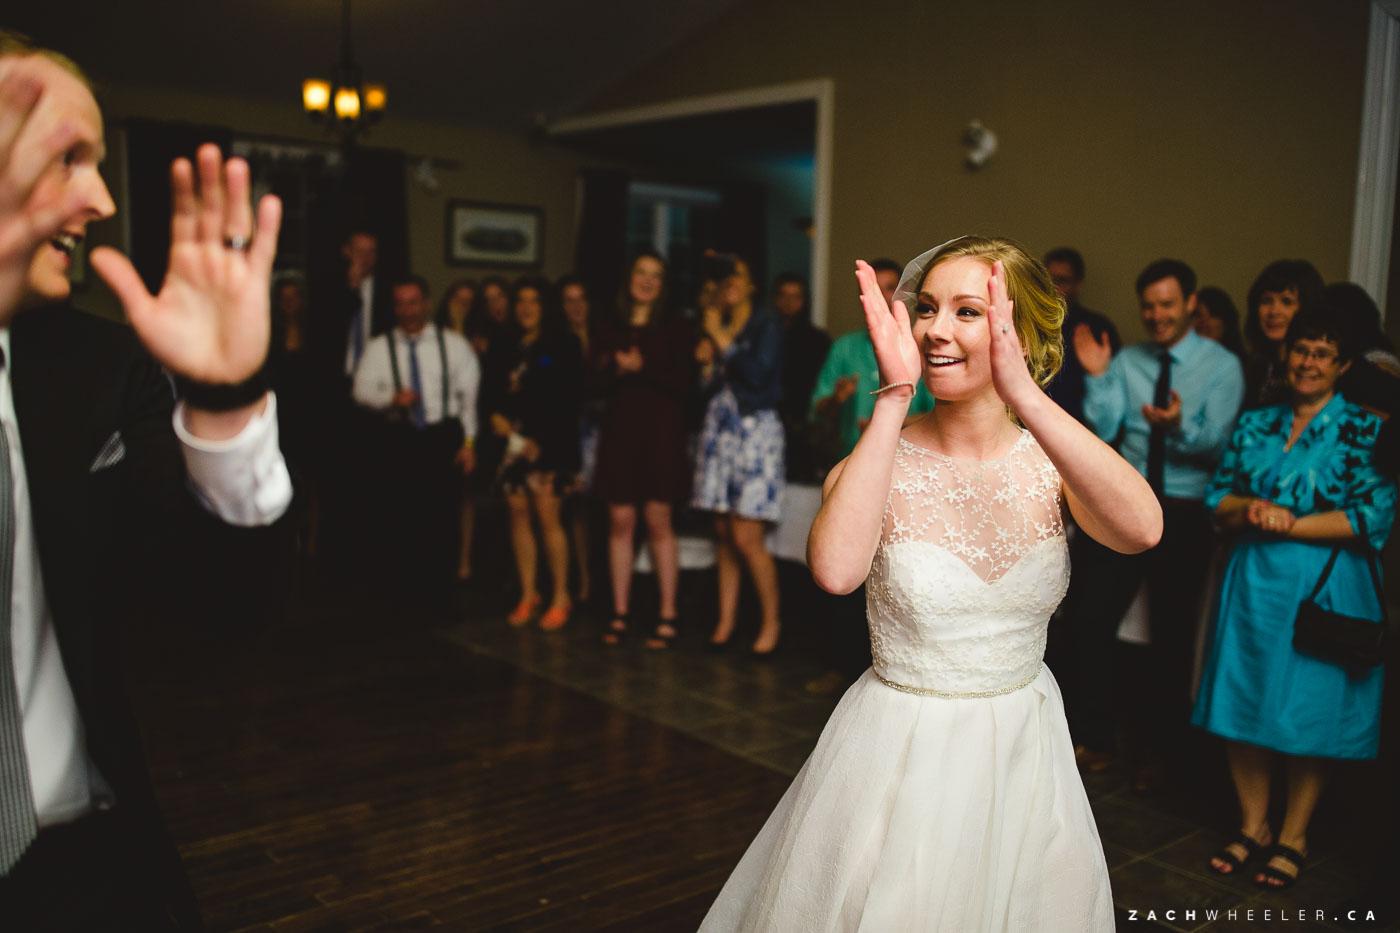 Sarah-Grant-Lesters-Fram-Wedding-107